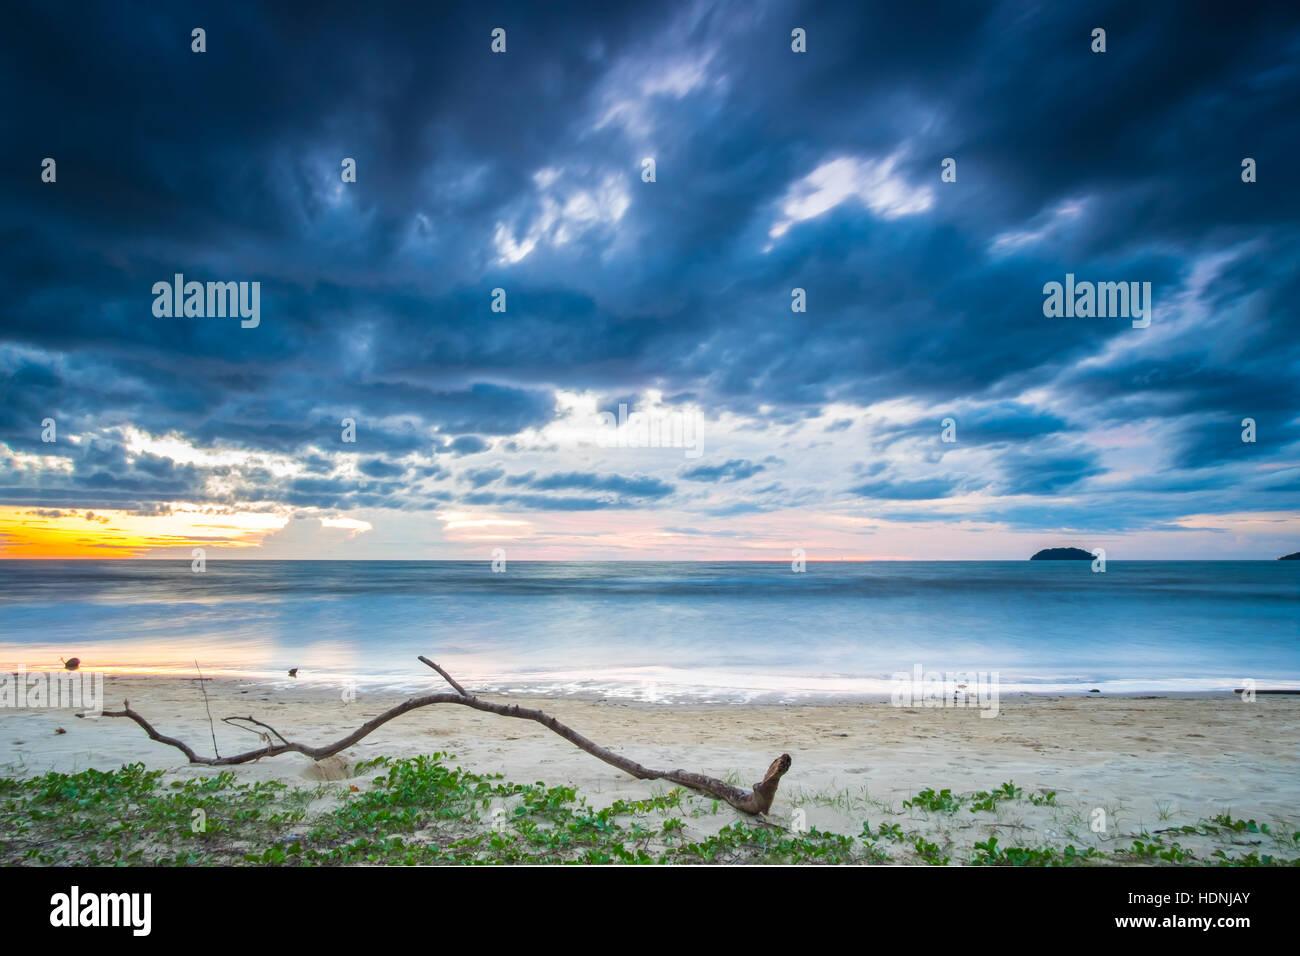 Sunset at Tanjung Aru beach, Kota Kinabalu. - Stock Image